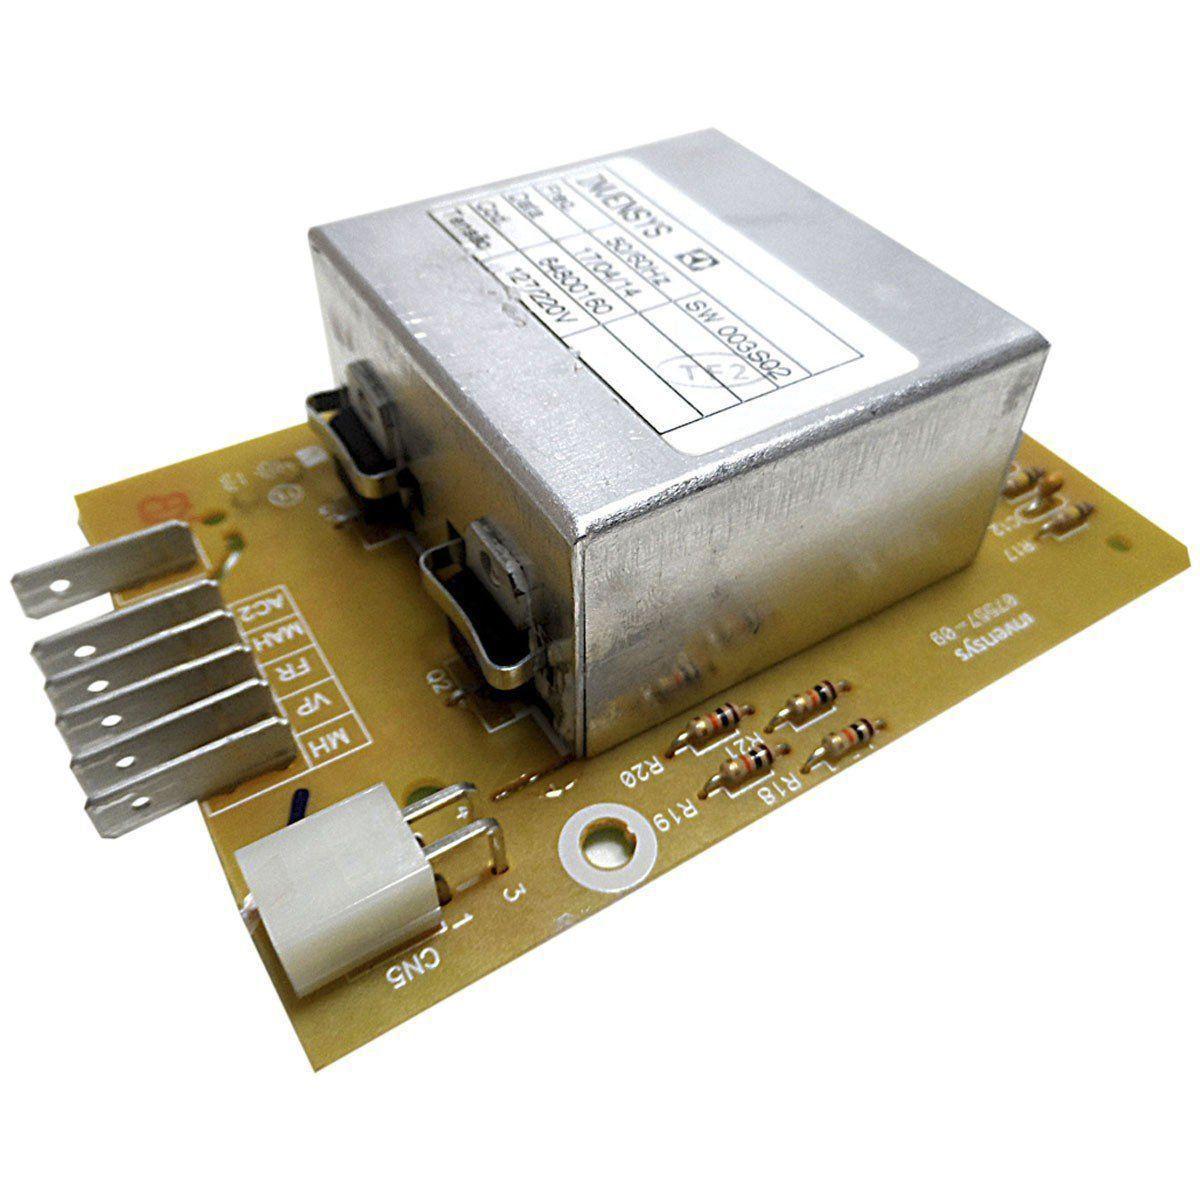 Placa Eletrônica Potência Lavadora Electrolux 64800160